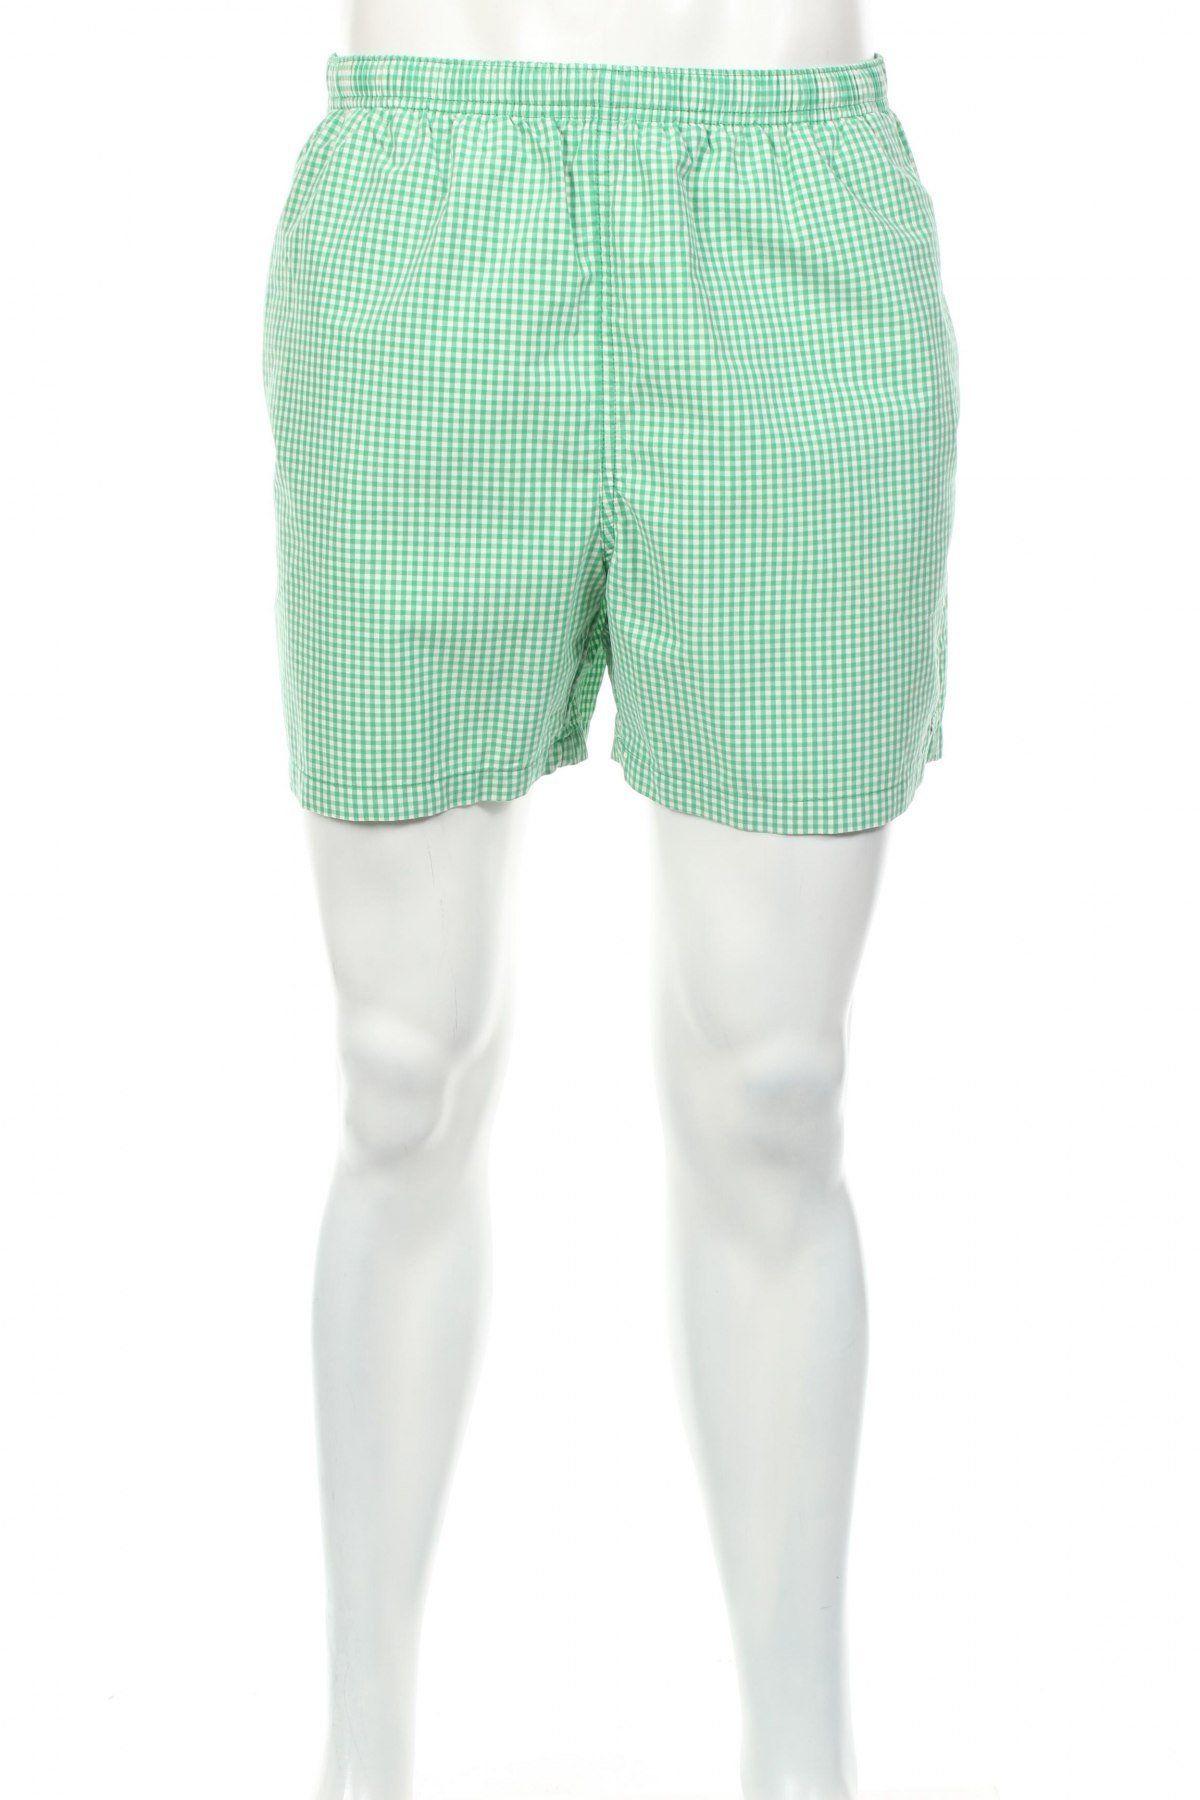 79d6833a93516 Vintage Polo Sport Ralph Lauren Green Checkered Trunks Swim Shorts Blue  Pony Green/White Size M